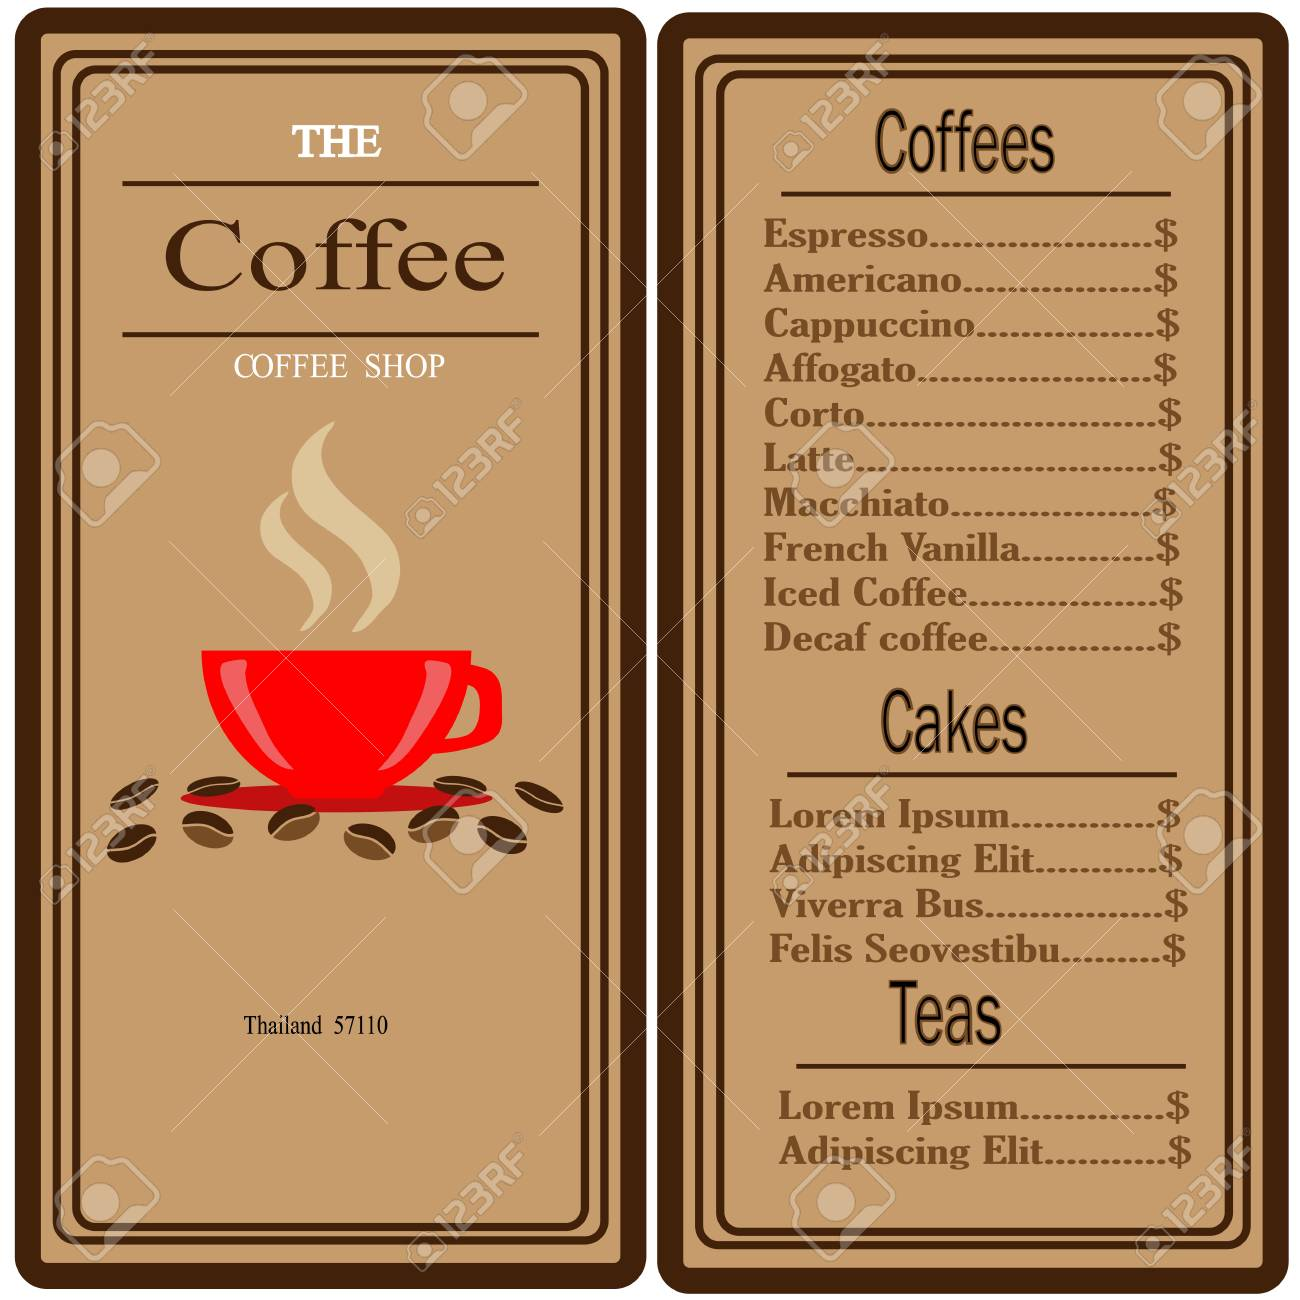 Attractive Coffee Shop Logo And Menu Design Vector Brochure Template. Coffee Cup  Silhouette. Stock Vector